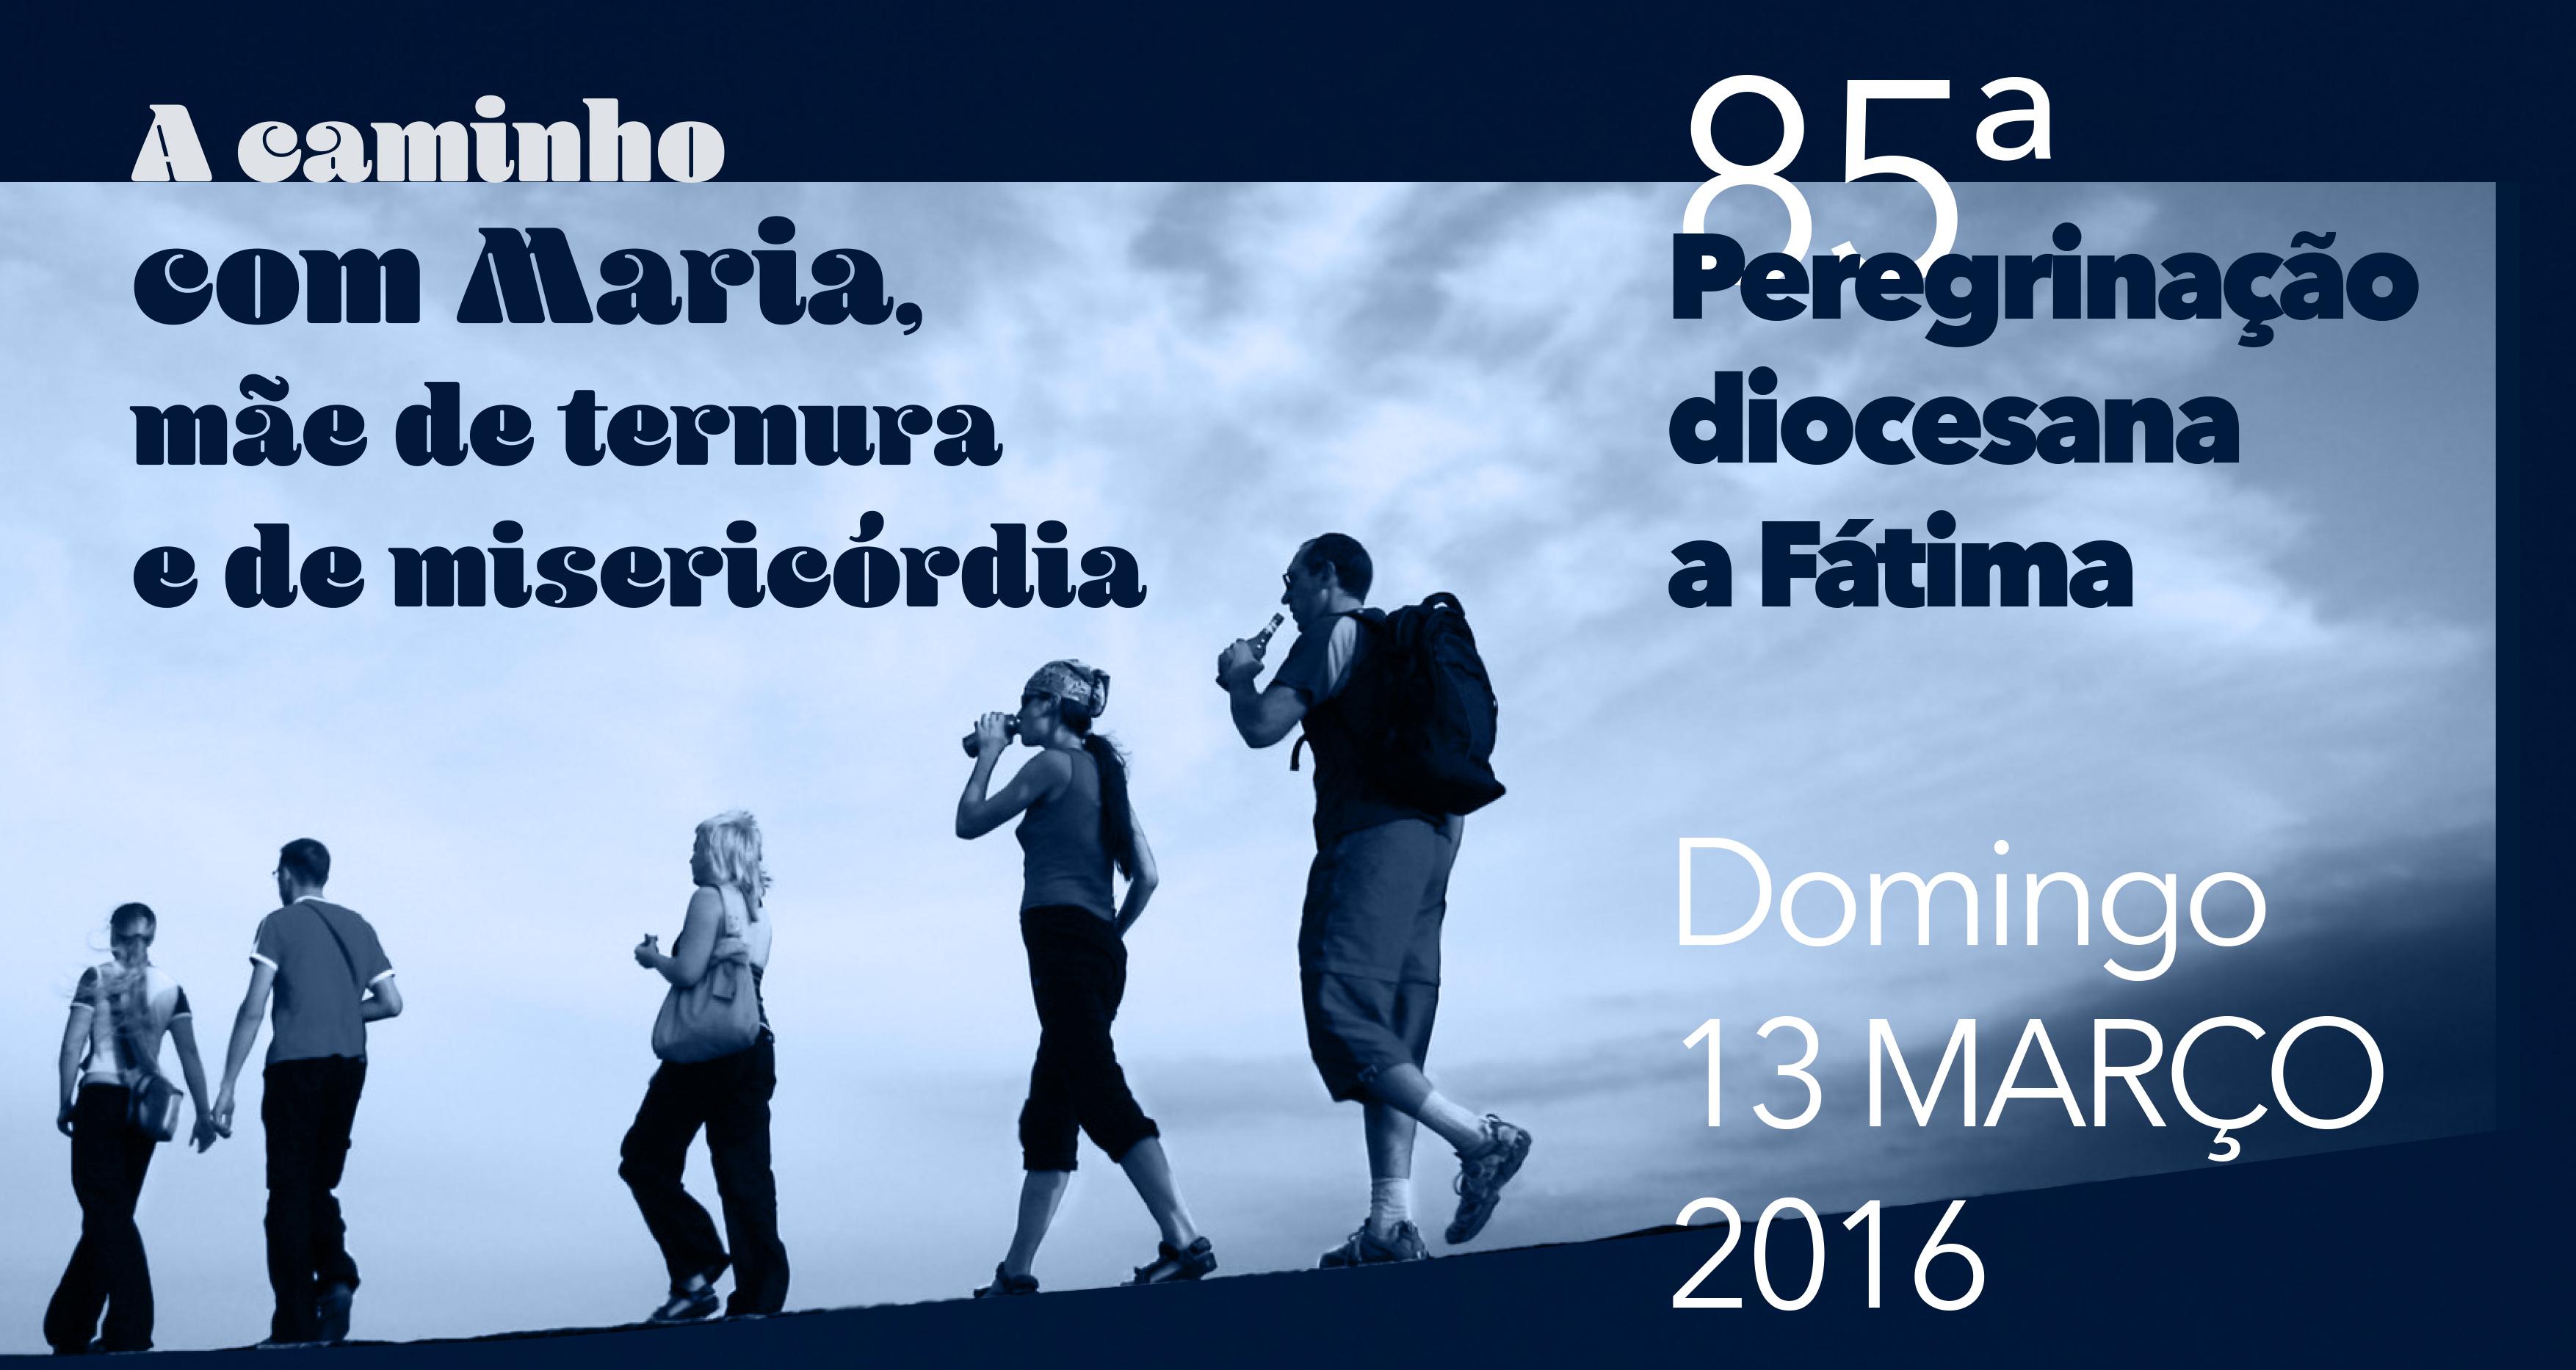 2016-03-08_peregrinacaodiocesana.jpg